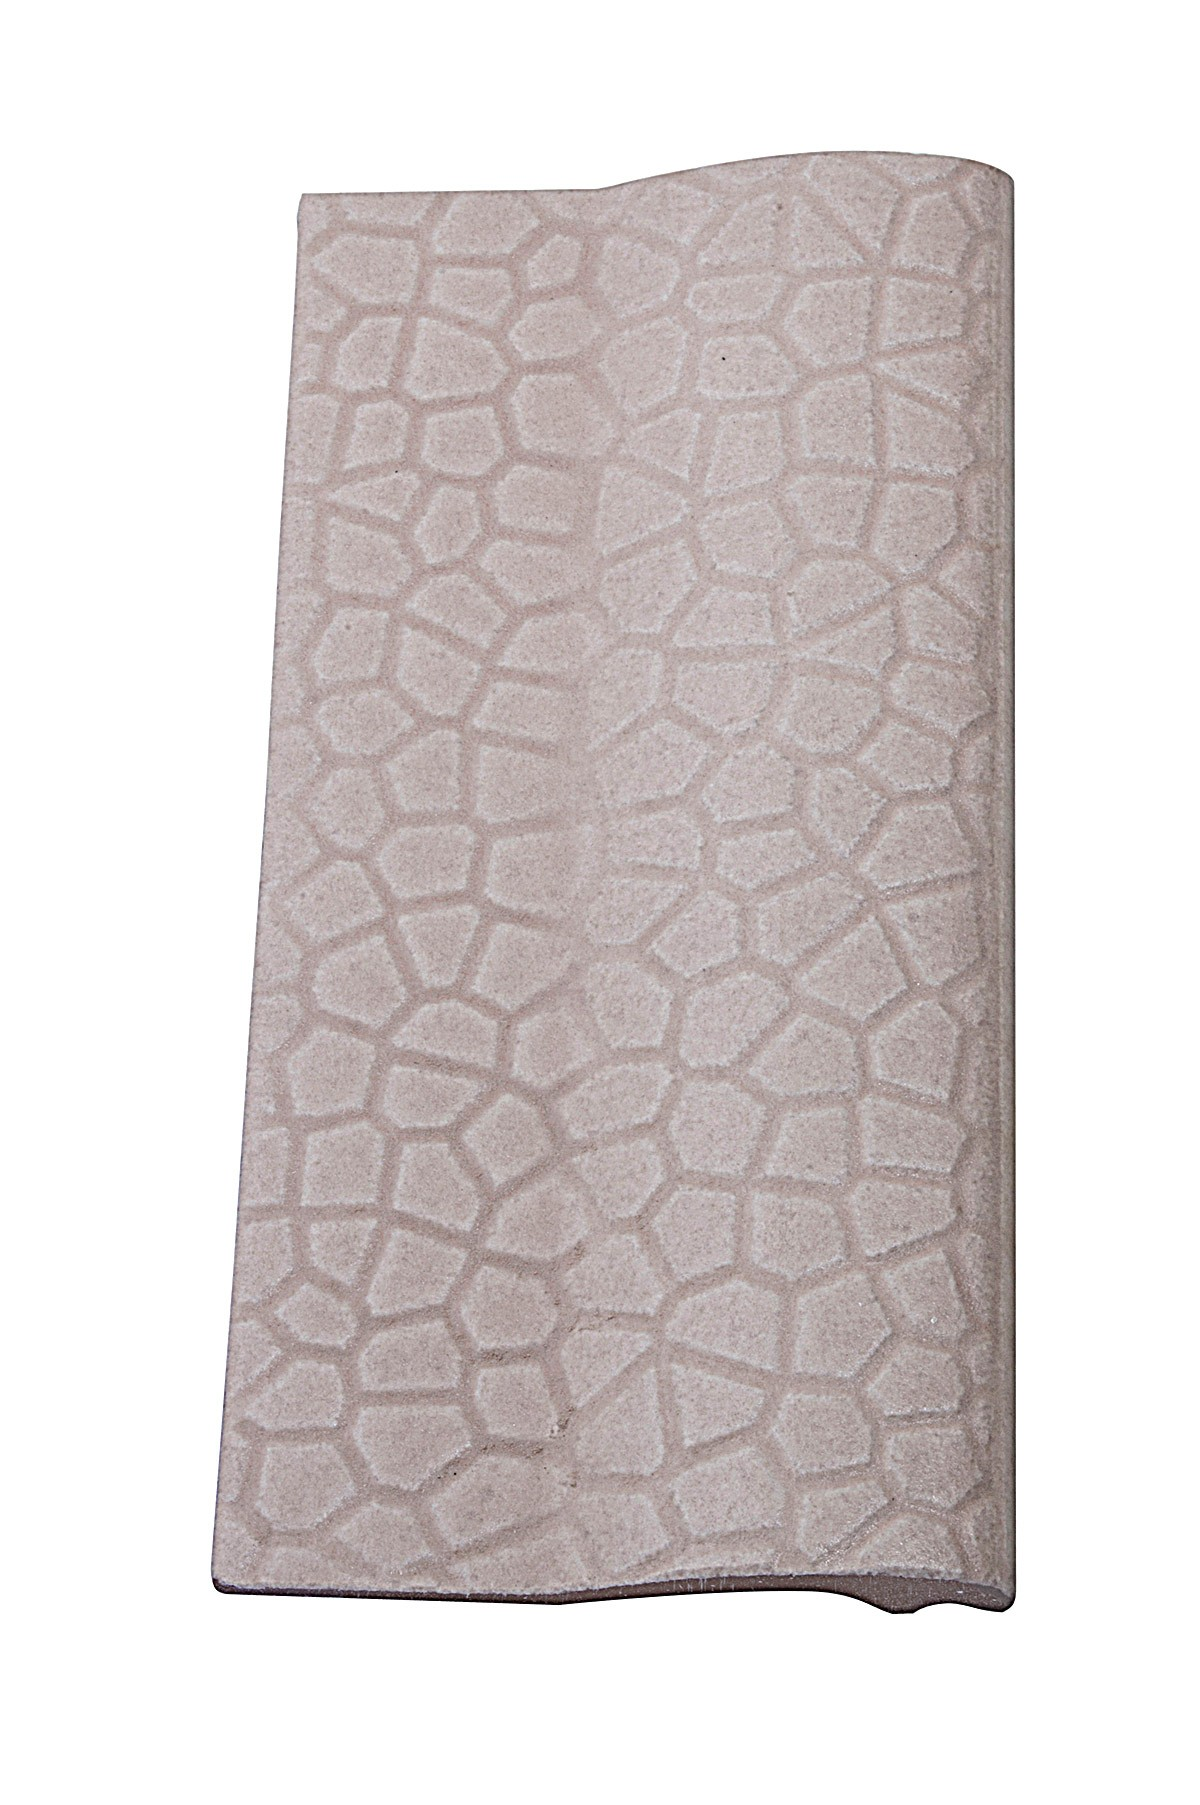 Borda de Piscina 12x25 Mosaico Bege